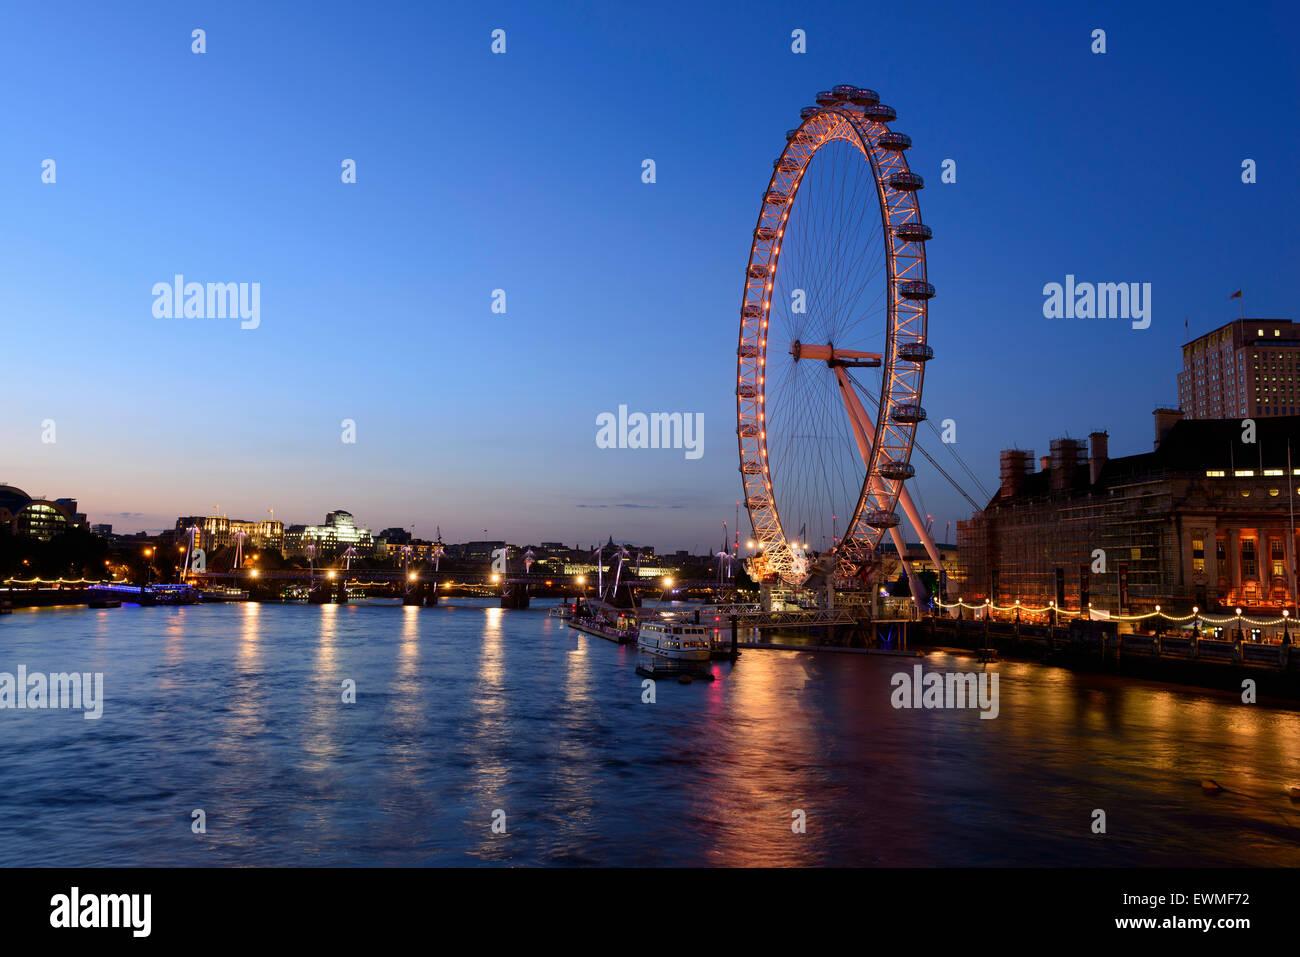 Millennium Wheel, London Eye, London, England, Vereinigtes Königreich Stockbild